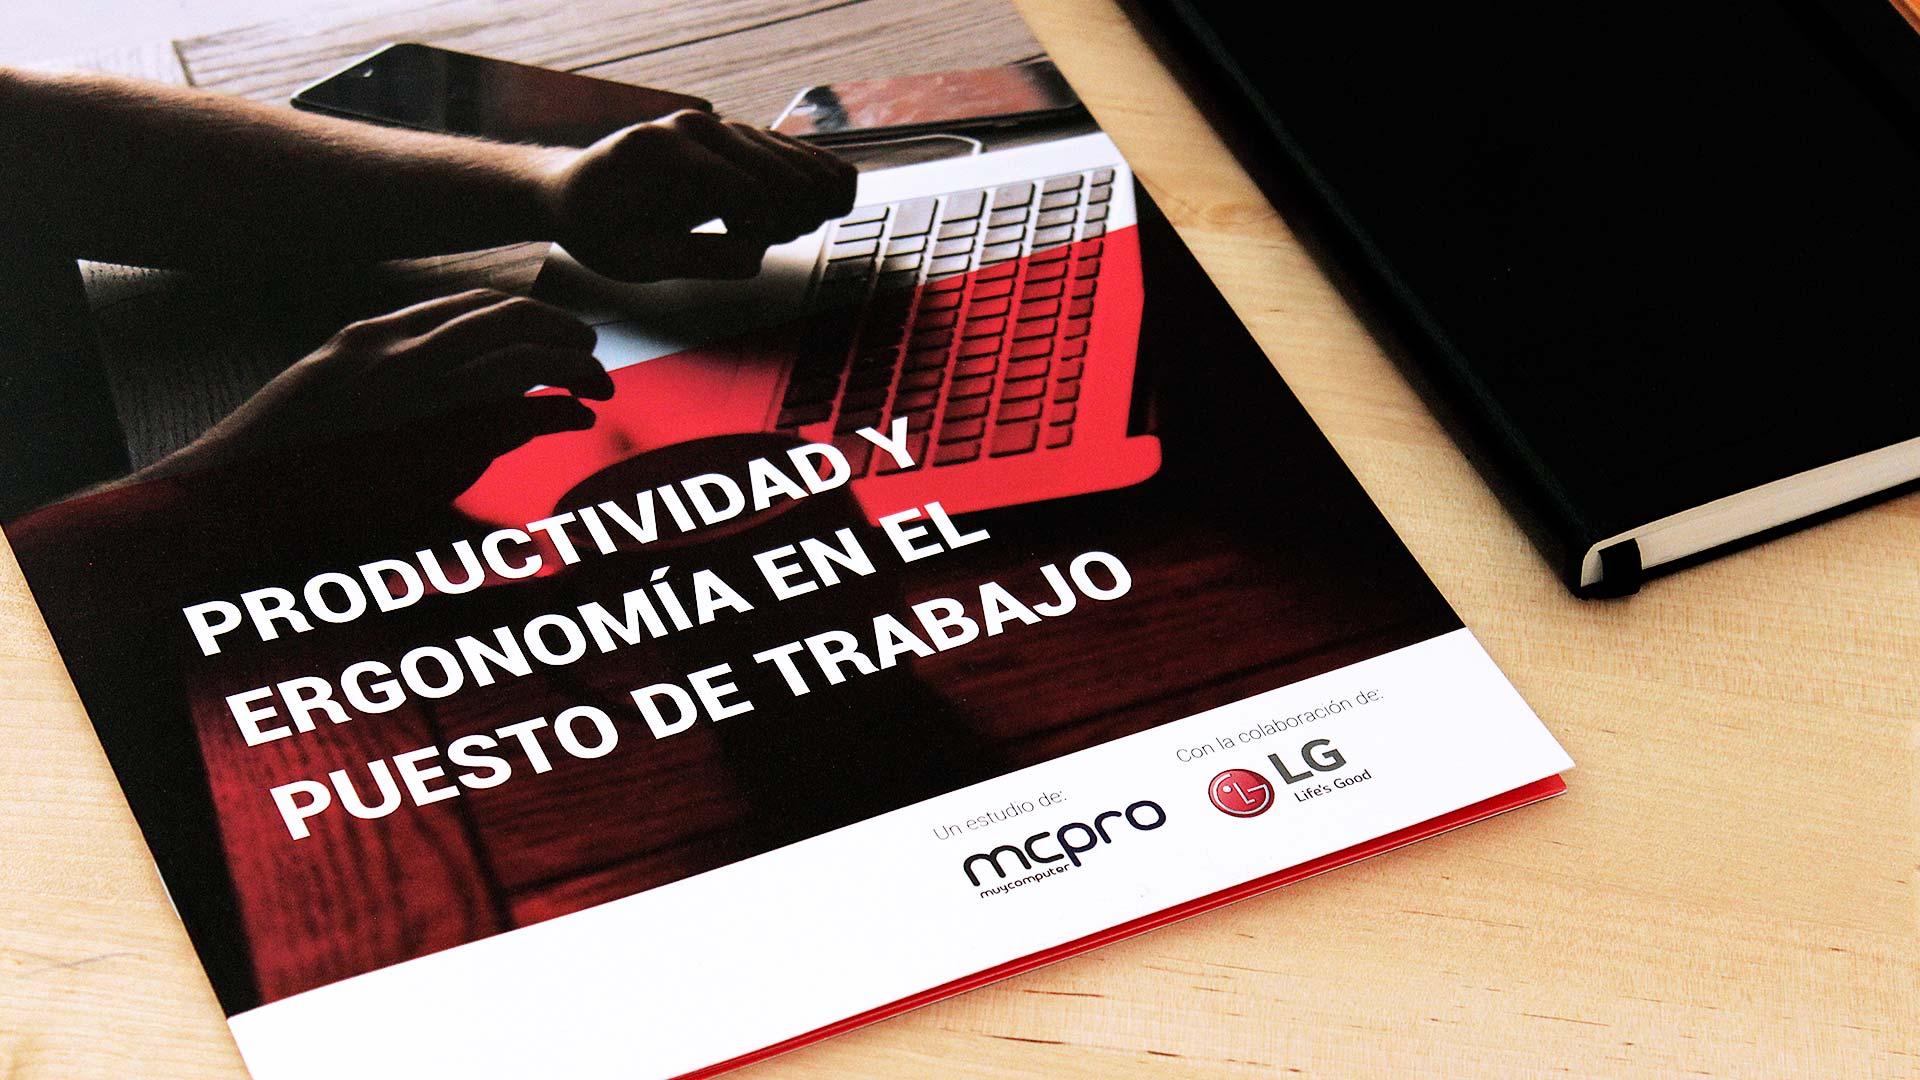 LG--content-marketing-informe-resumen-ejecutivo-ebook-ergonomia--2017_02